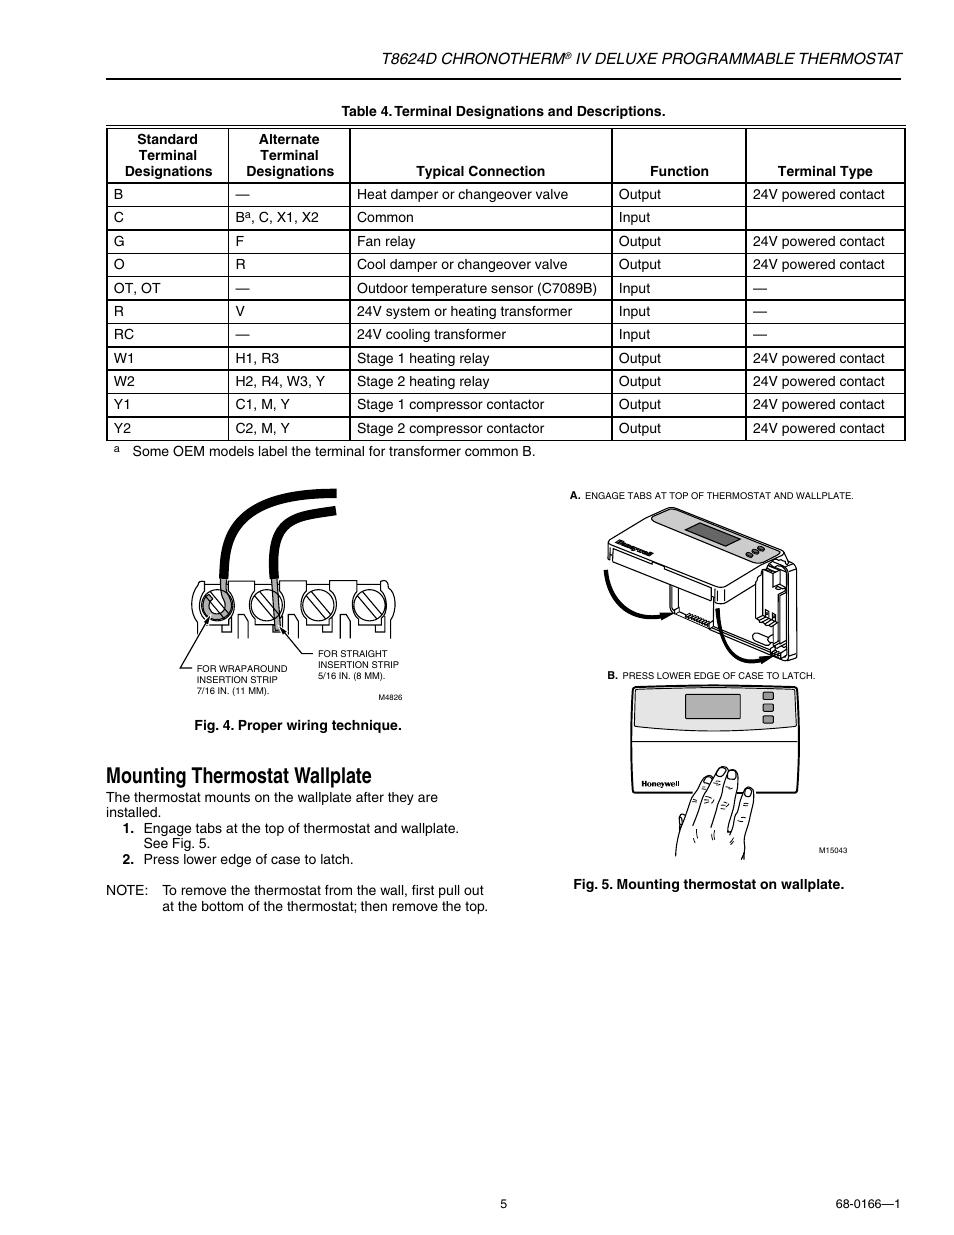 thermostat terminal designations